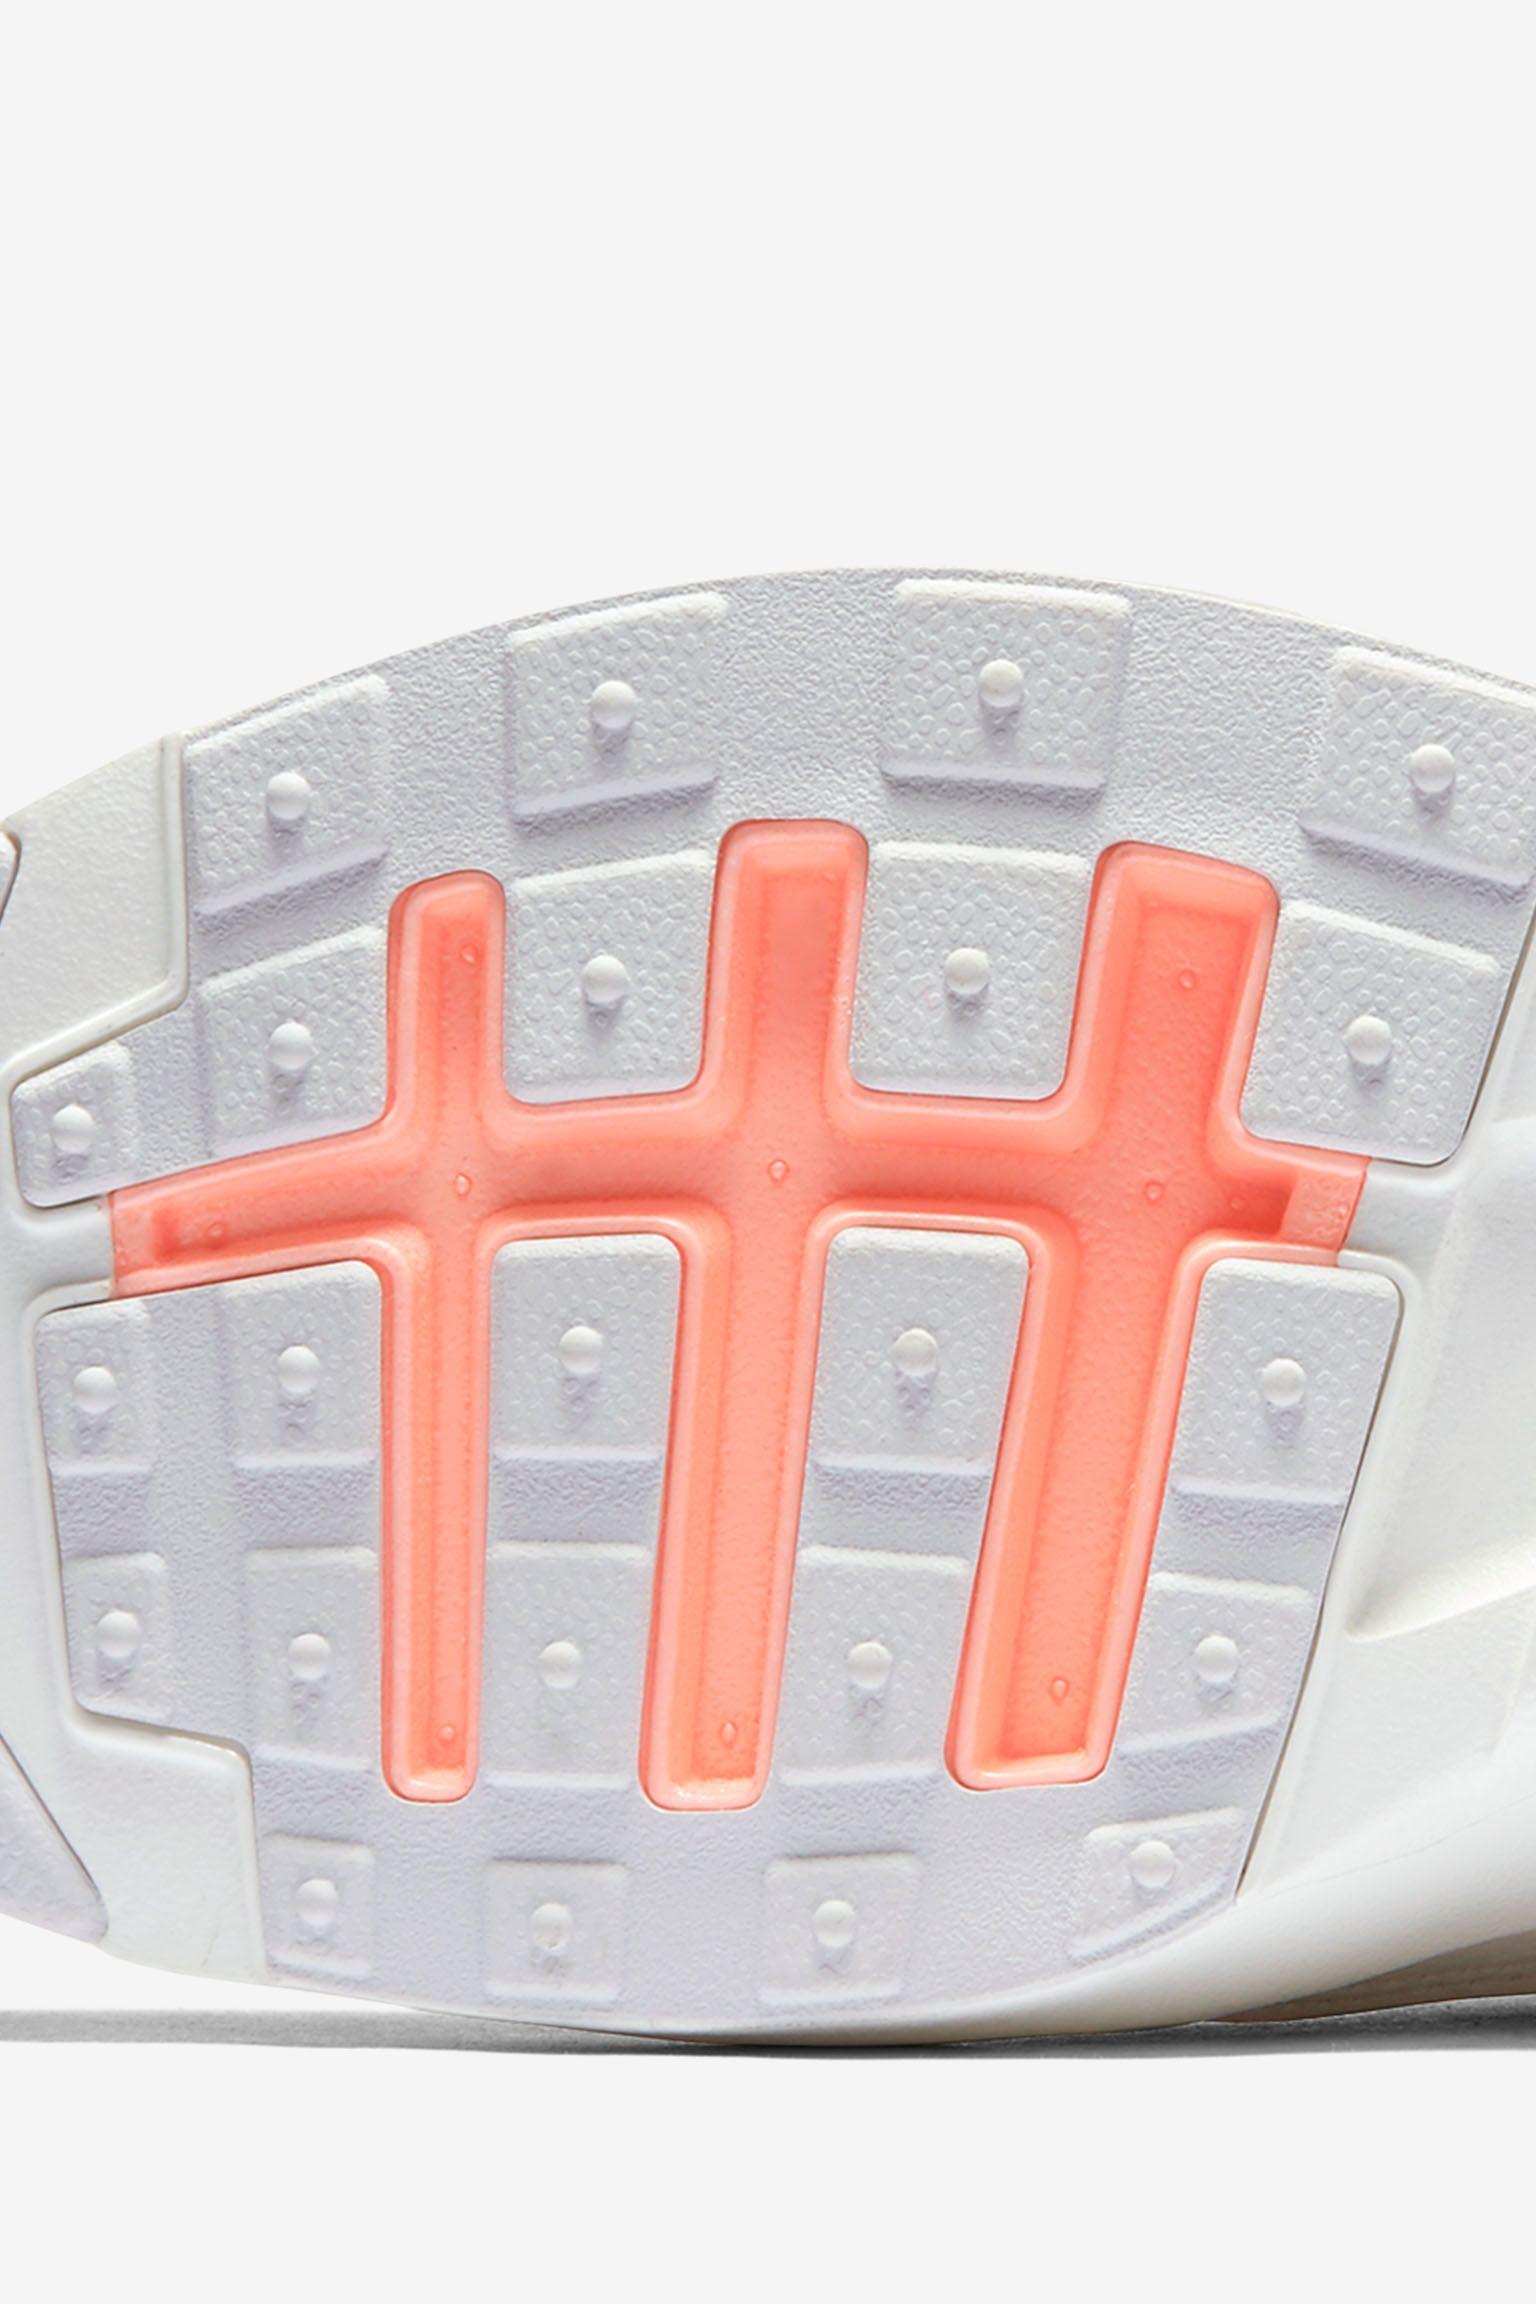 Women's Nike Air Max Thea Ultra 'Iron Ore & Atomic Pink'